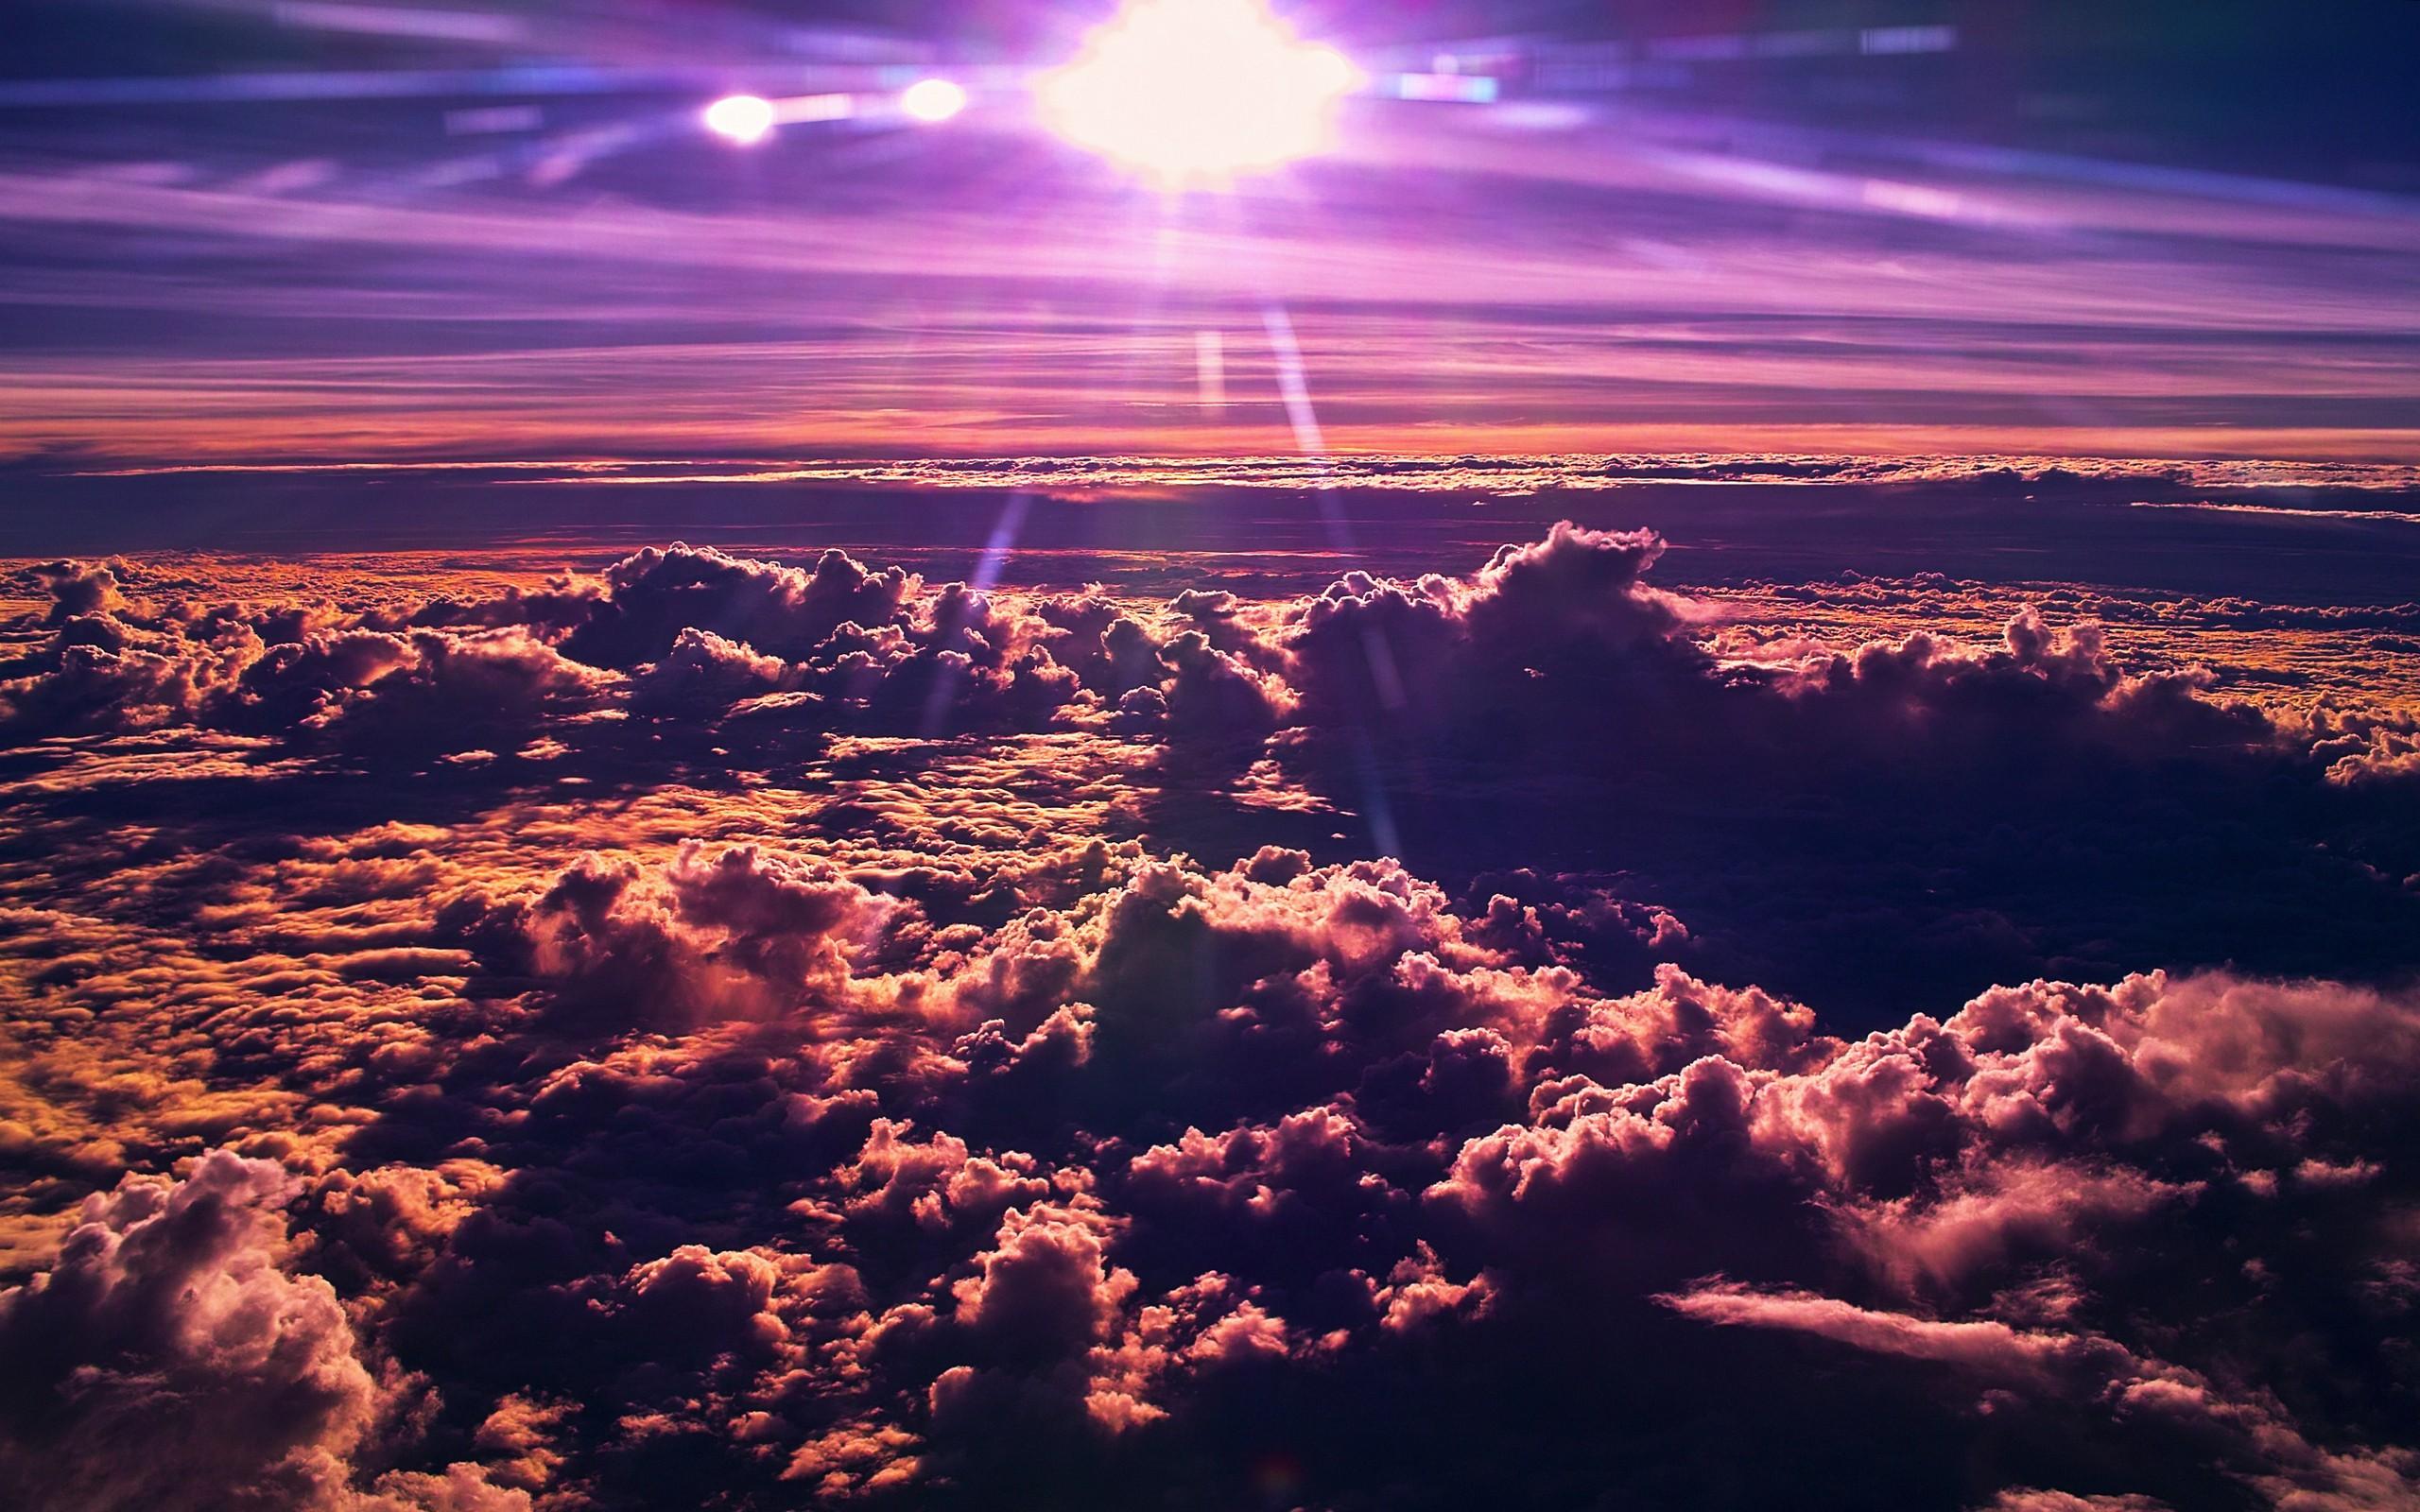 sky desktop background purple